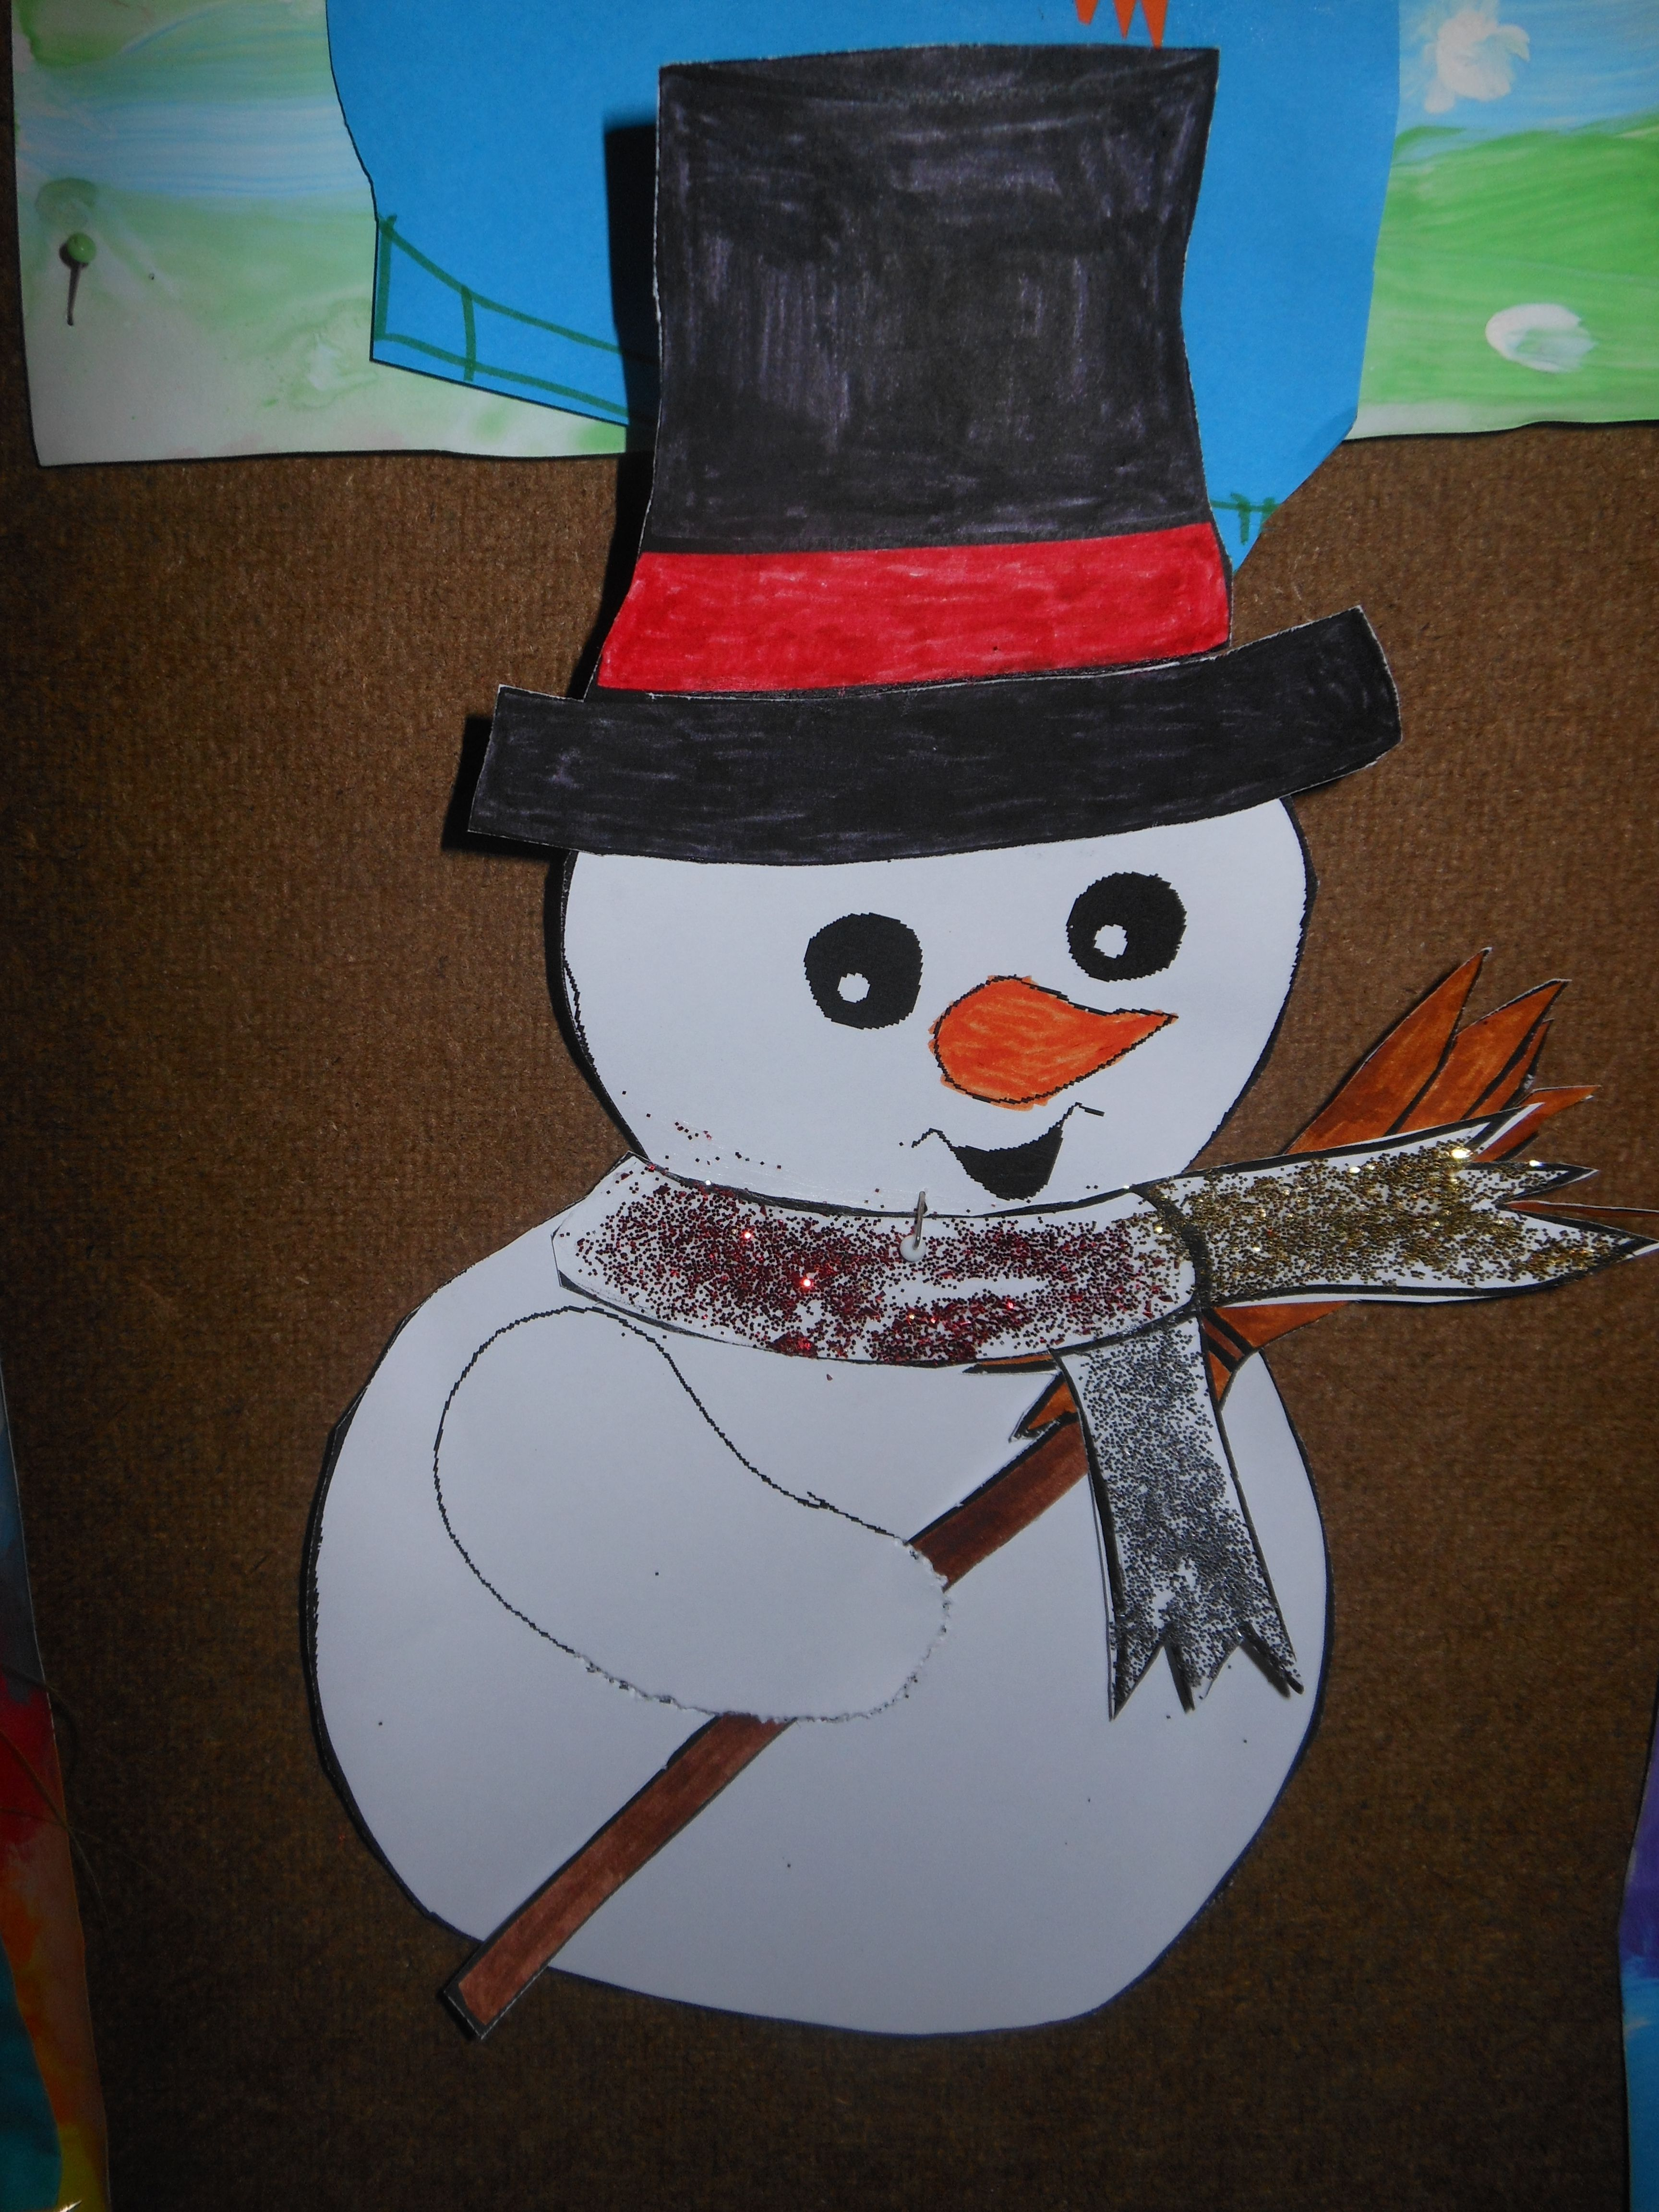 sneeuwman met glittersjaal